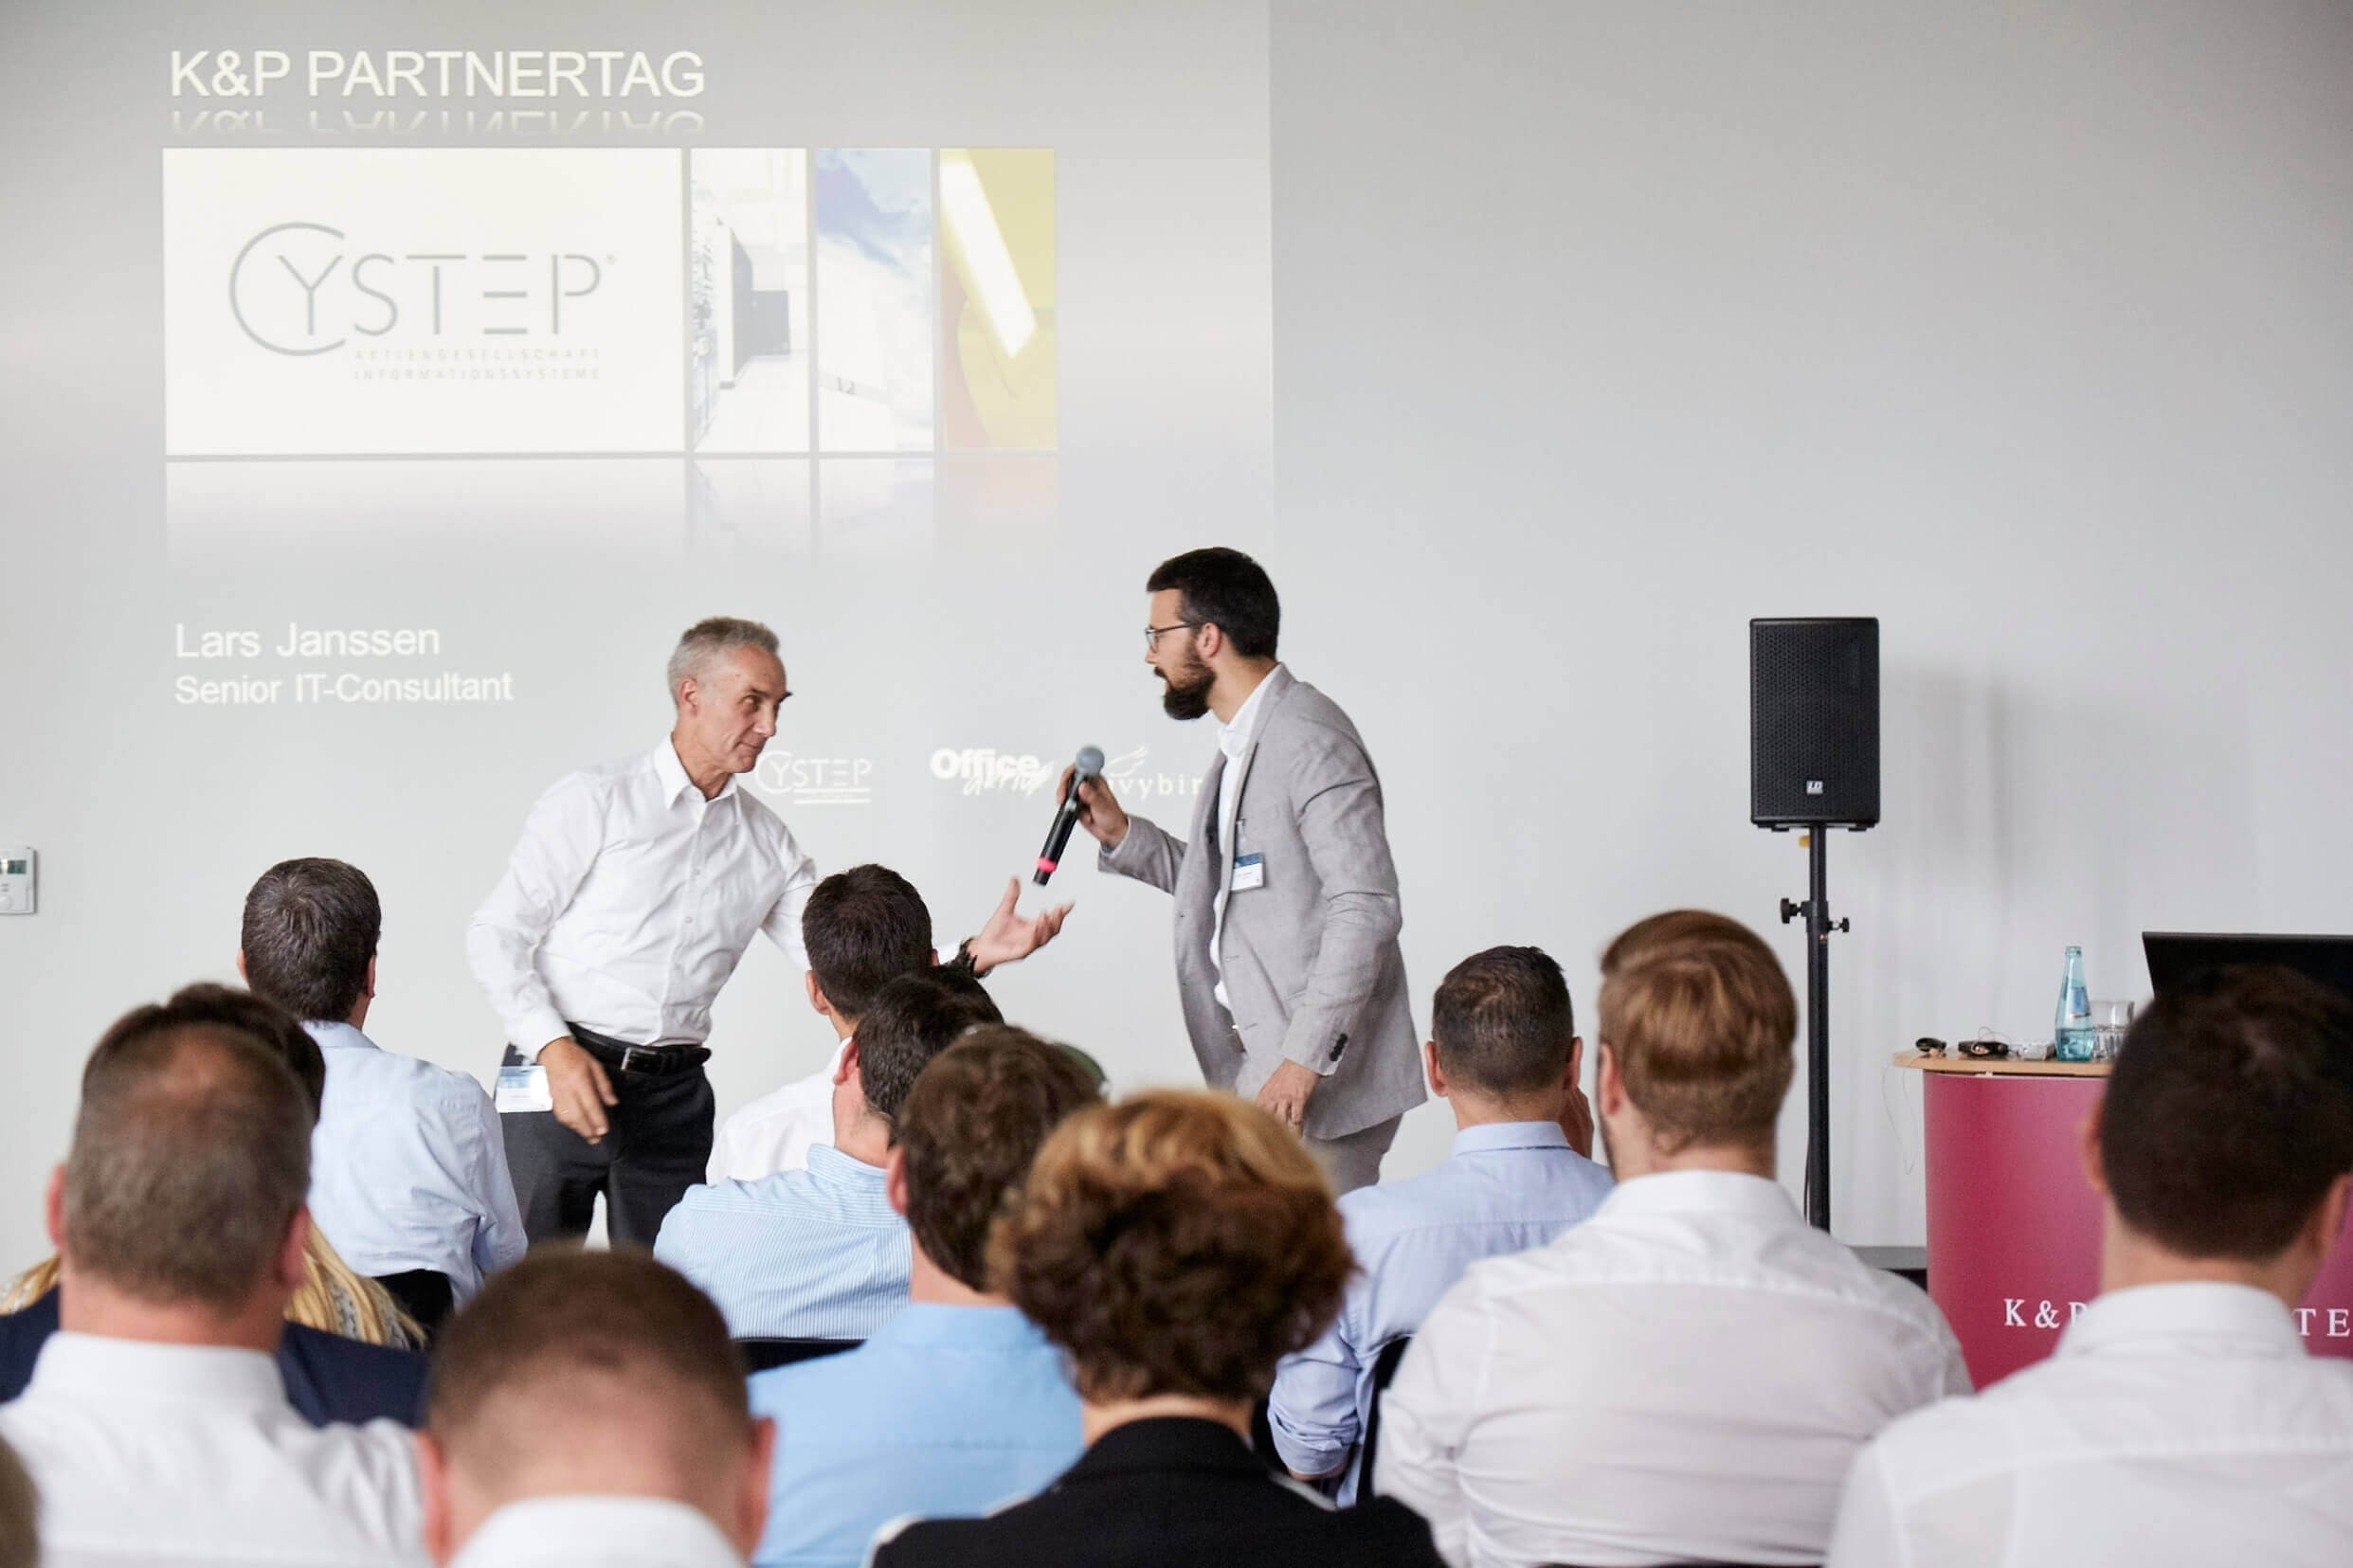 KPC Partnertag Vortrag FTS